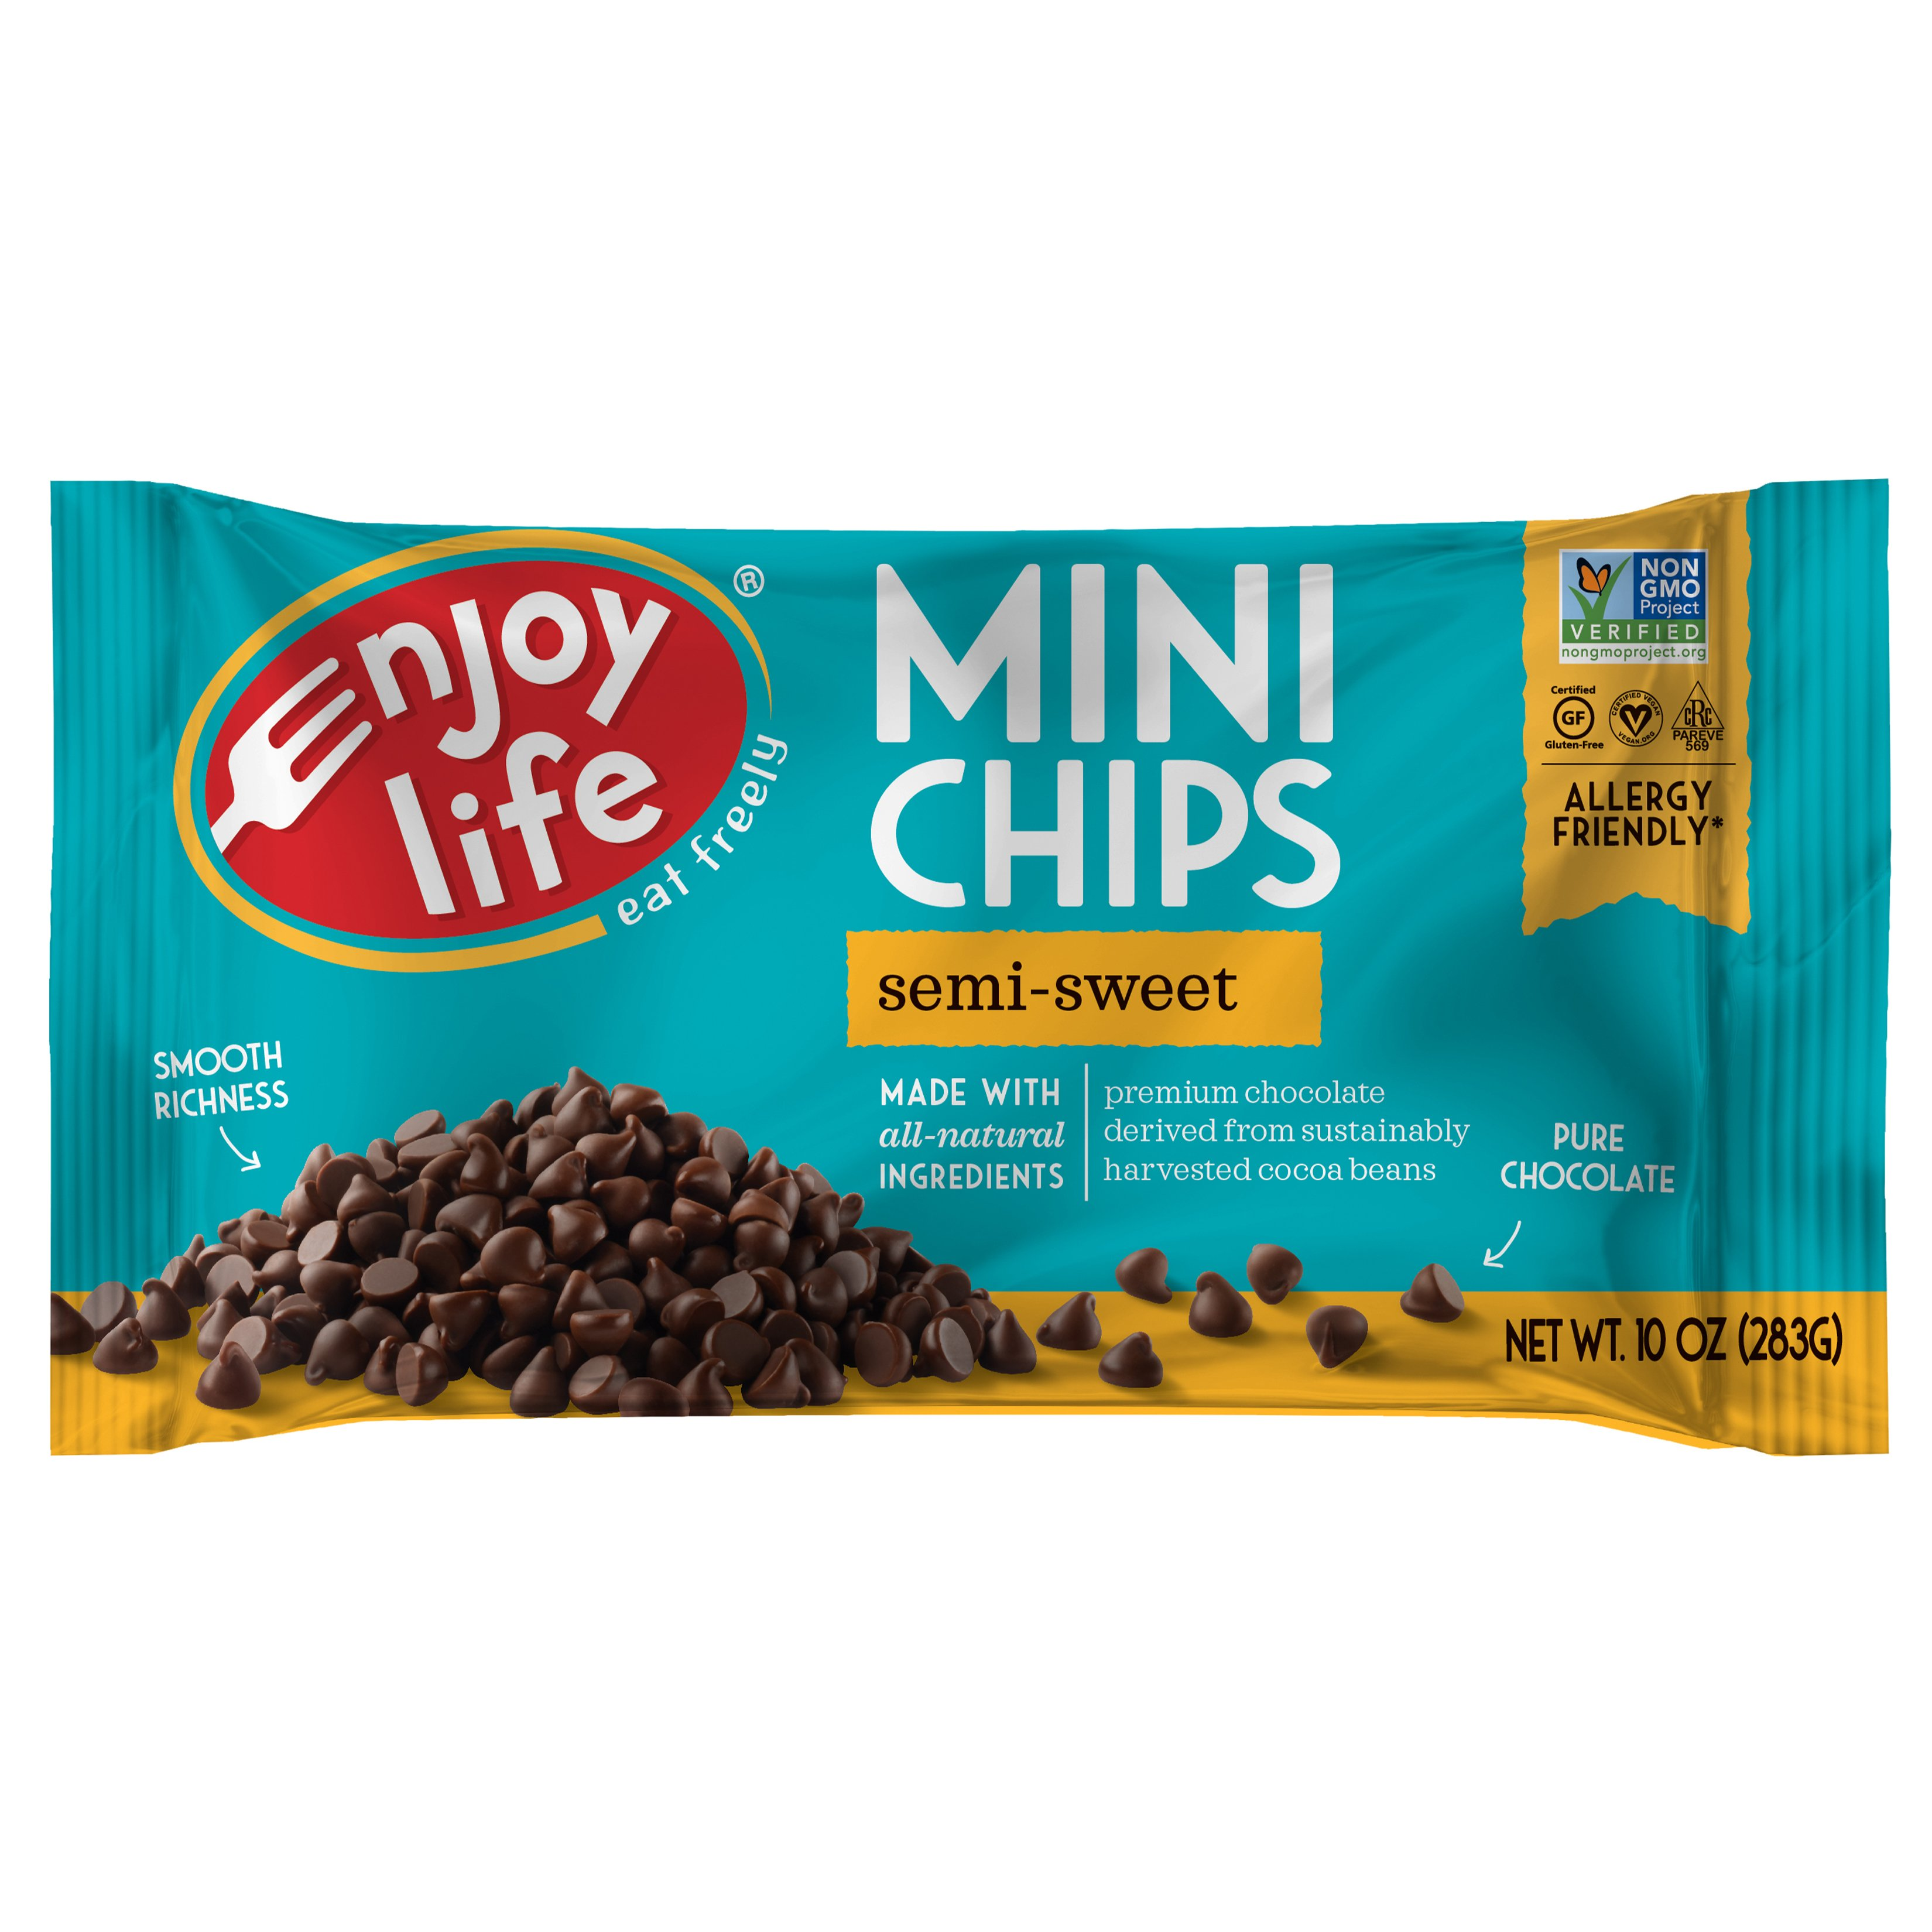 Enjoy Life Vegan Allergy Friendly Semi-Sweet Chocolate Mini Chips ...